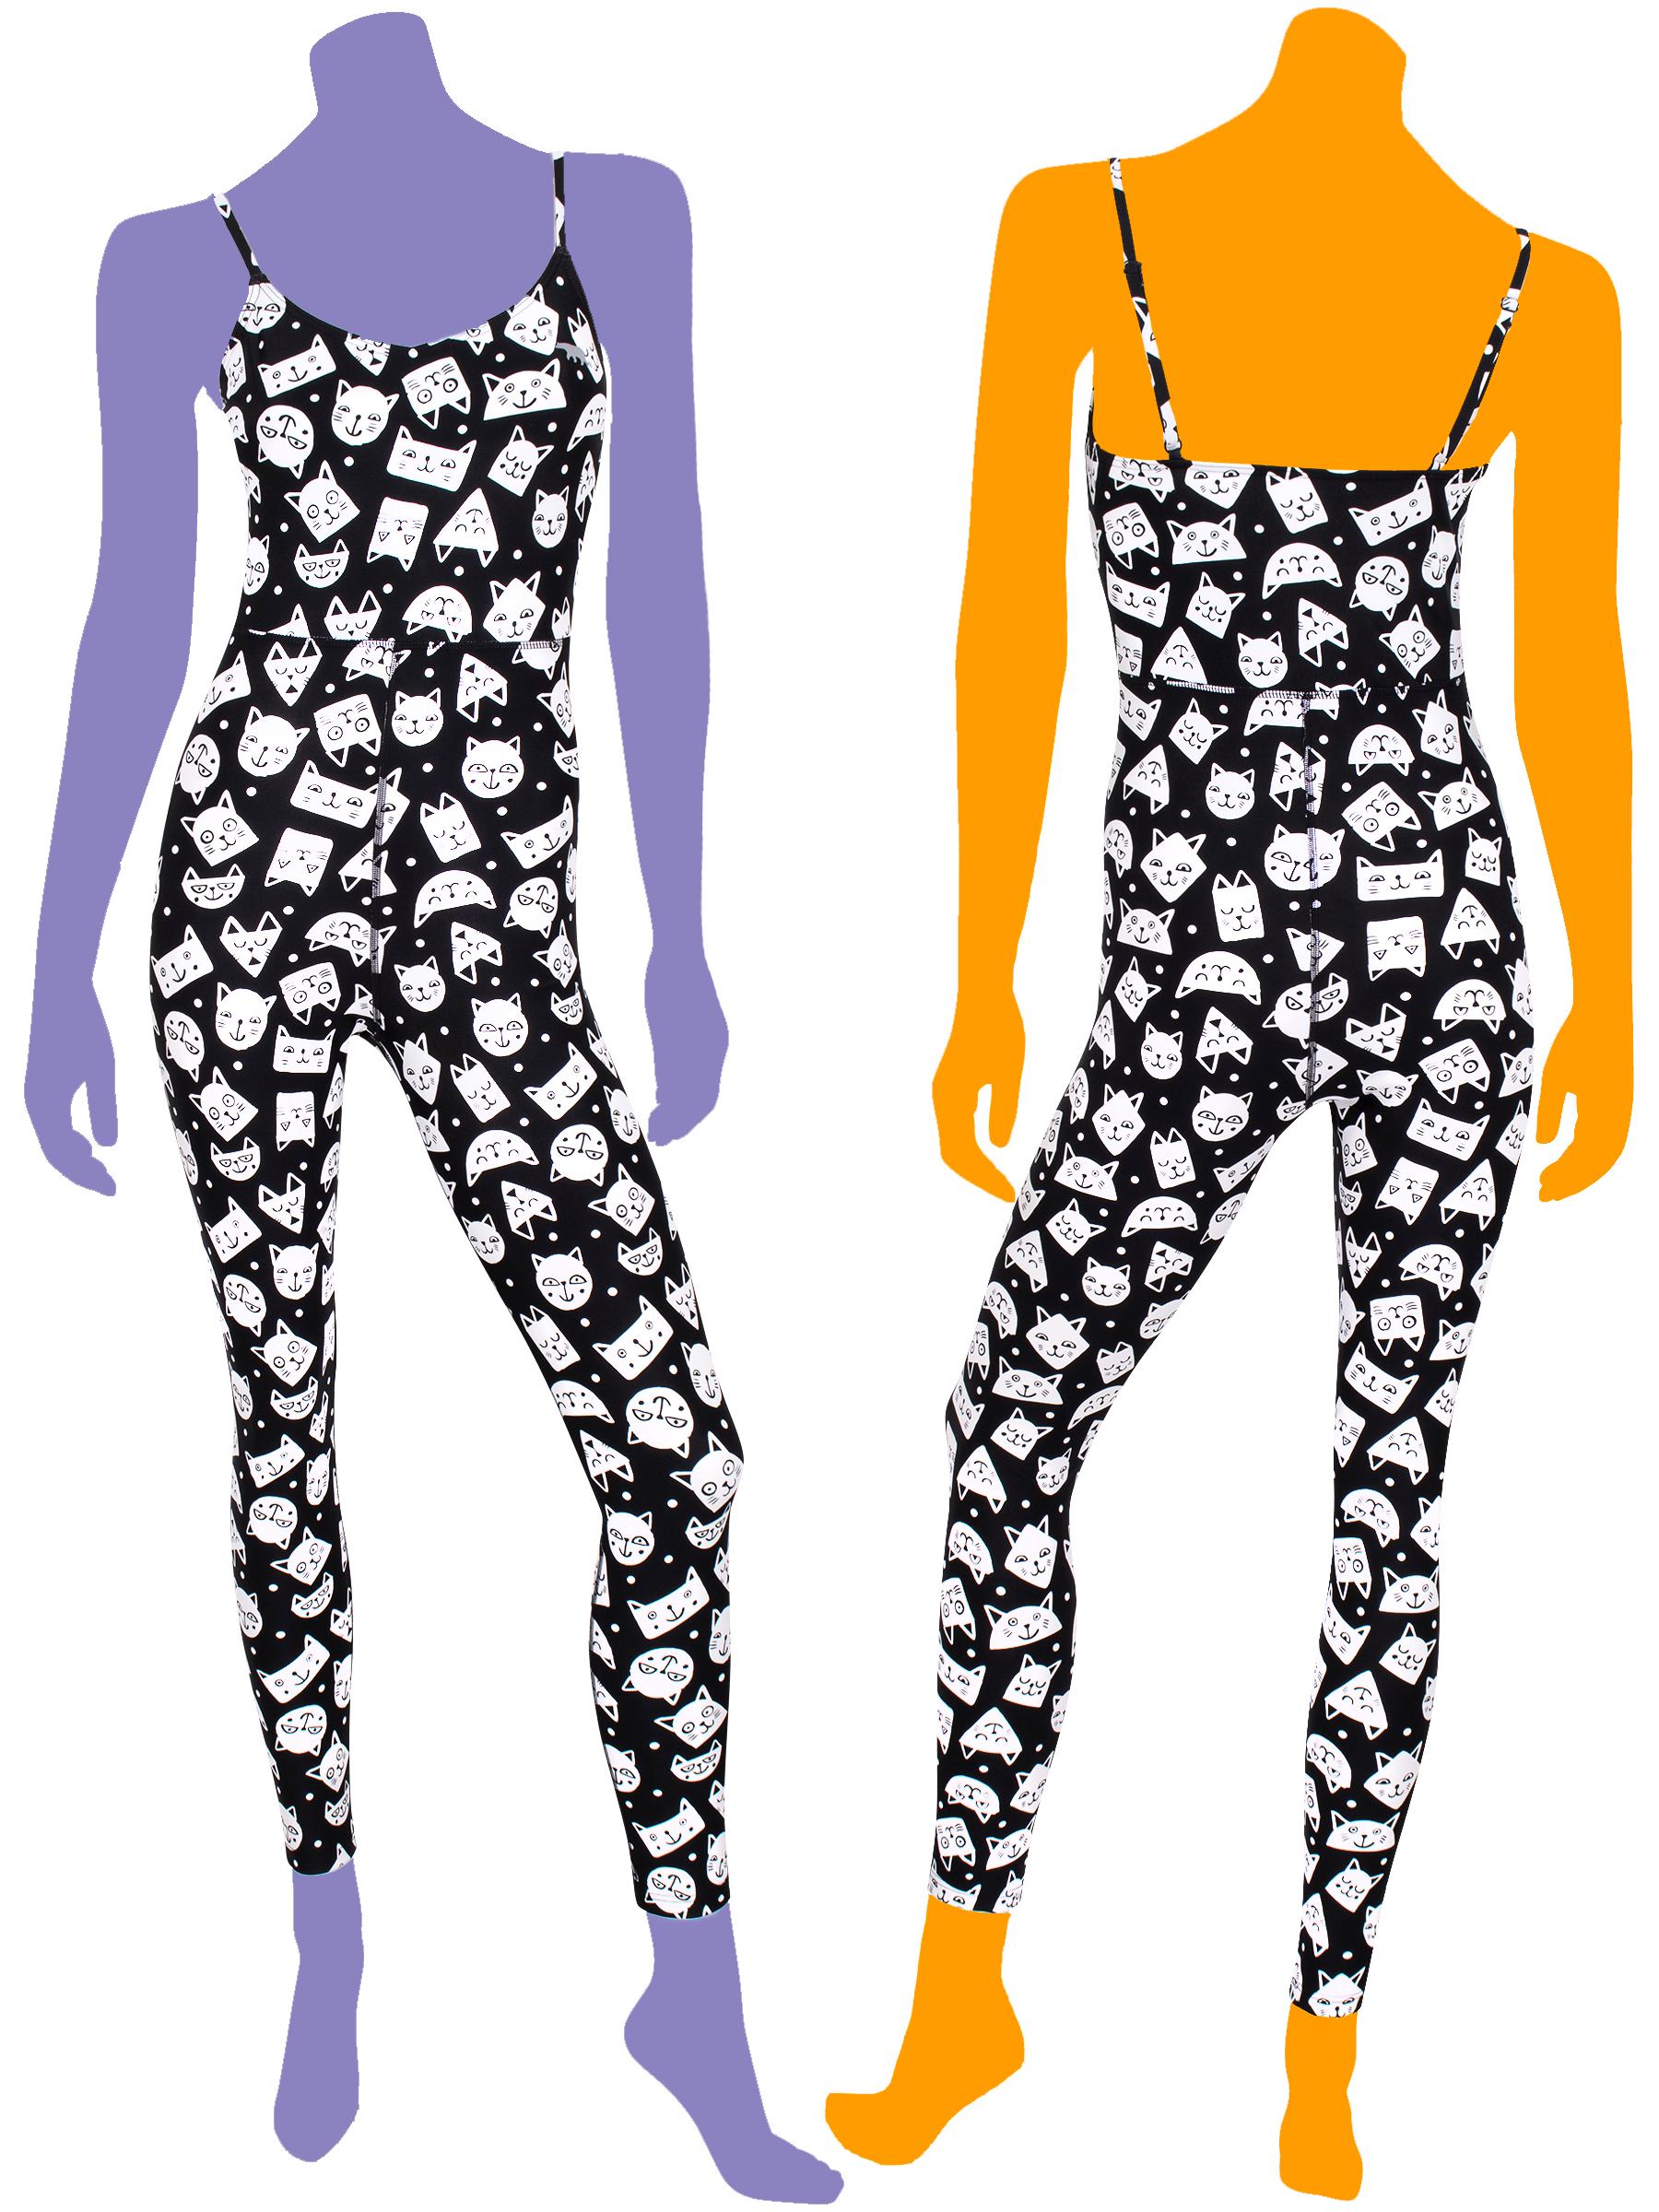 Crap Housewife Unitard - Dress it up or dress it down. The Crap Housewife Unitard is now $99.95.